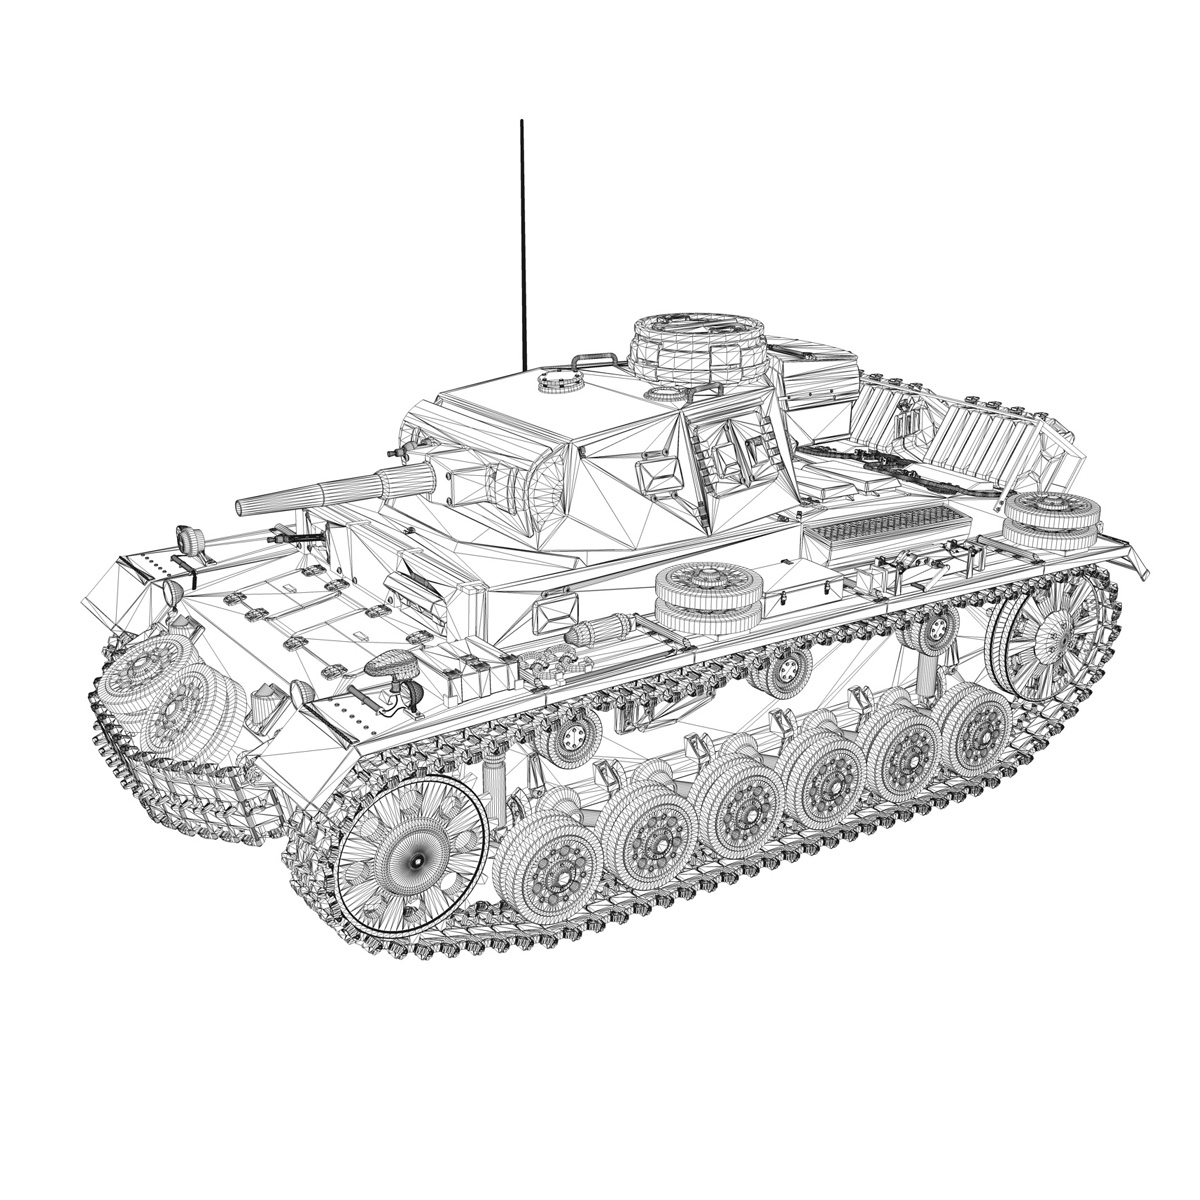 pzkpfw iii – panzer 3 – ausf.g – dak – 211 3d model 3ds c4d fbx lwo lw lws obj 266474